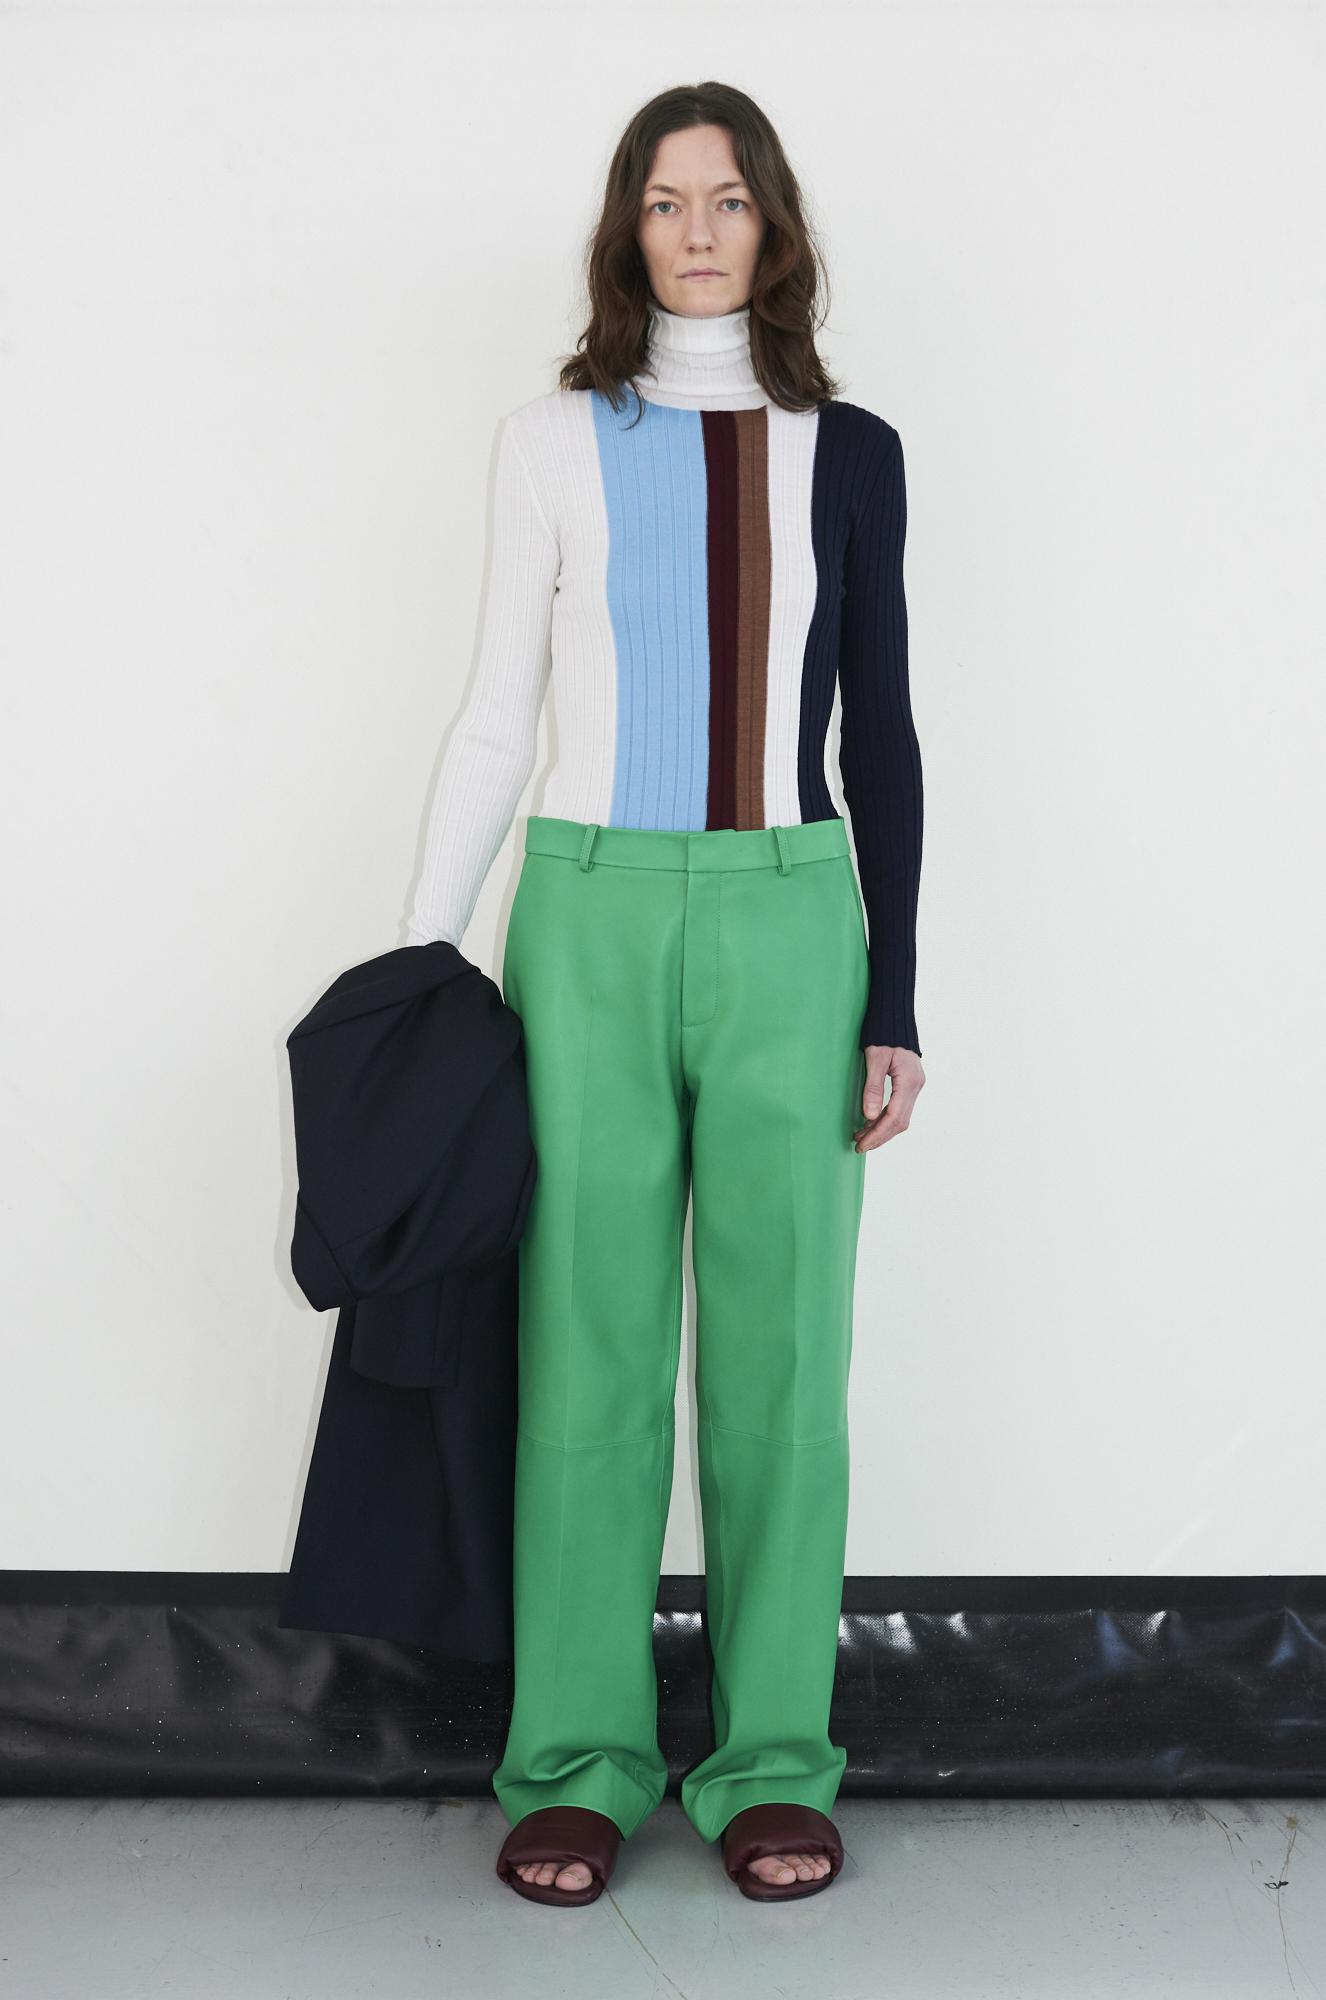 GAUCHERE Fall Winter 2021 Paris Fashion Week LOOK 12 Coat THEDA, Knit Top TAIO, Trousers TIDA